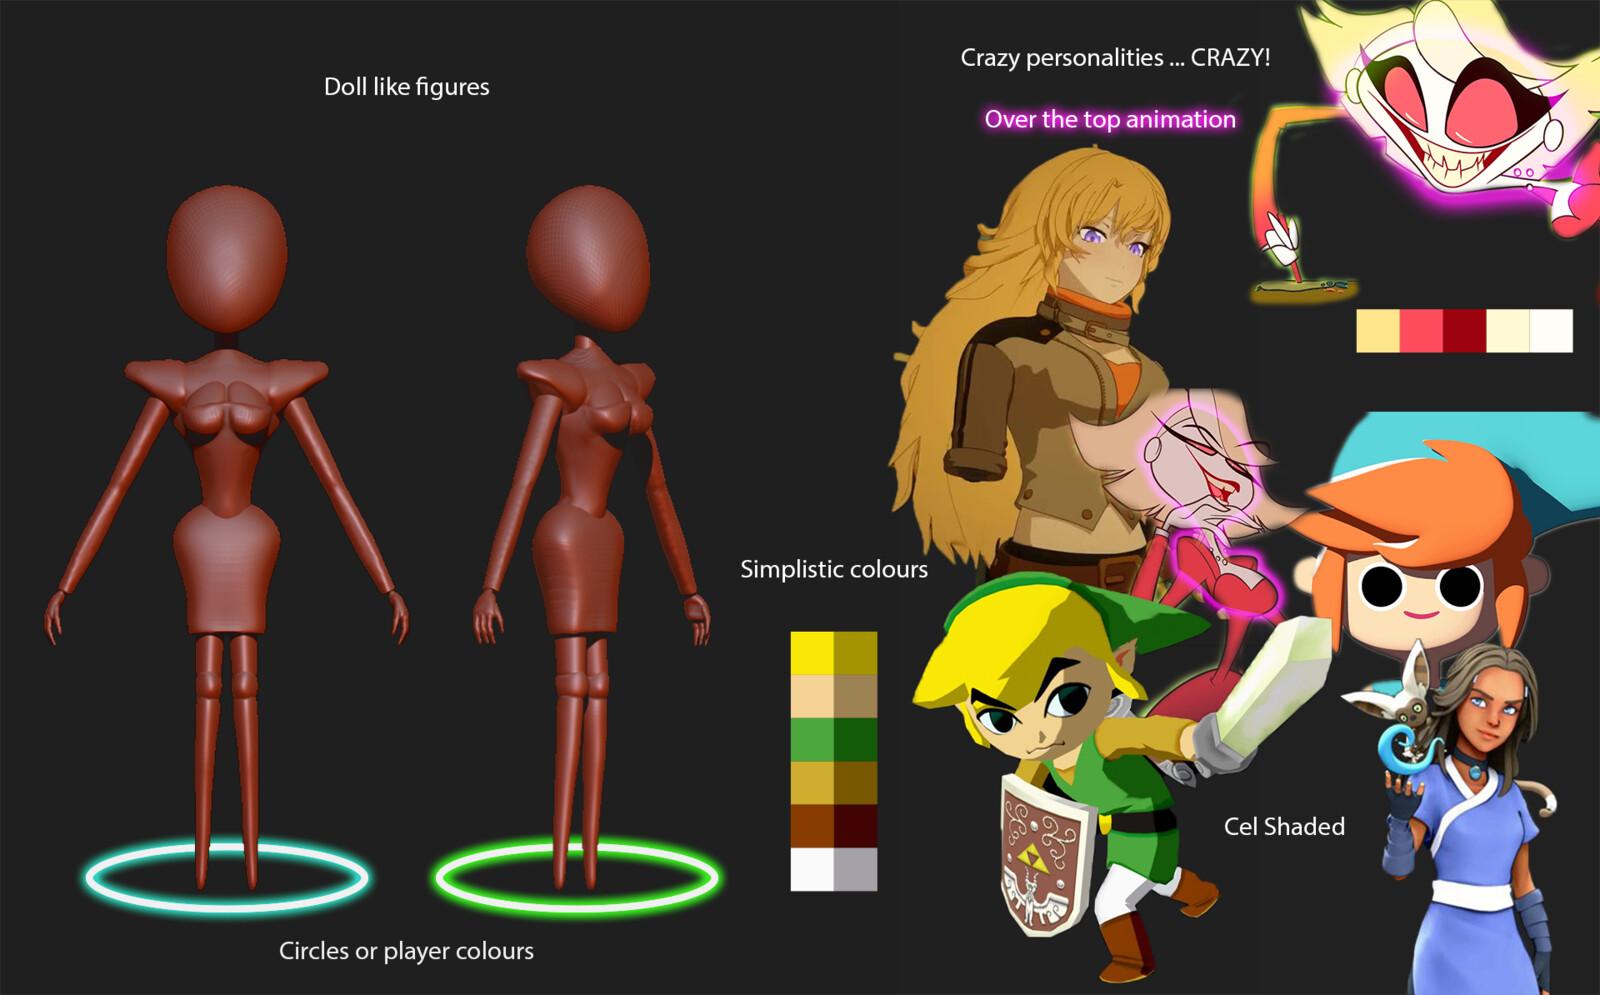 Original Character Design Mood Board (Not my Concept Art)